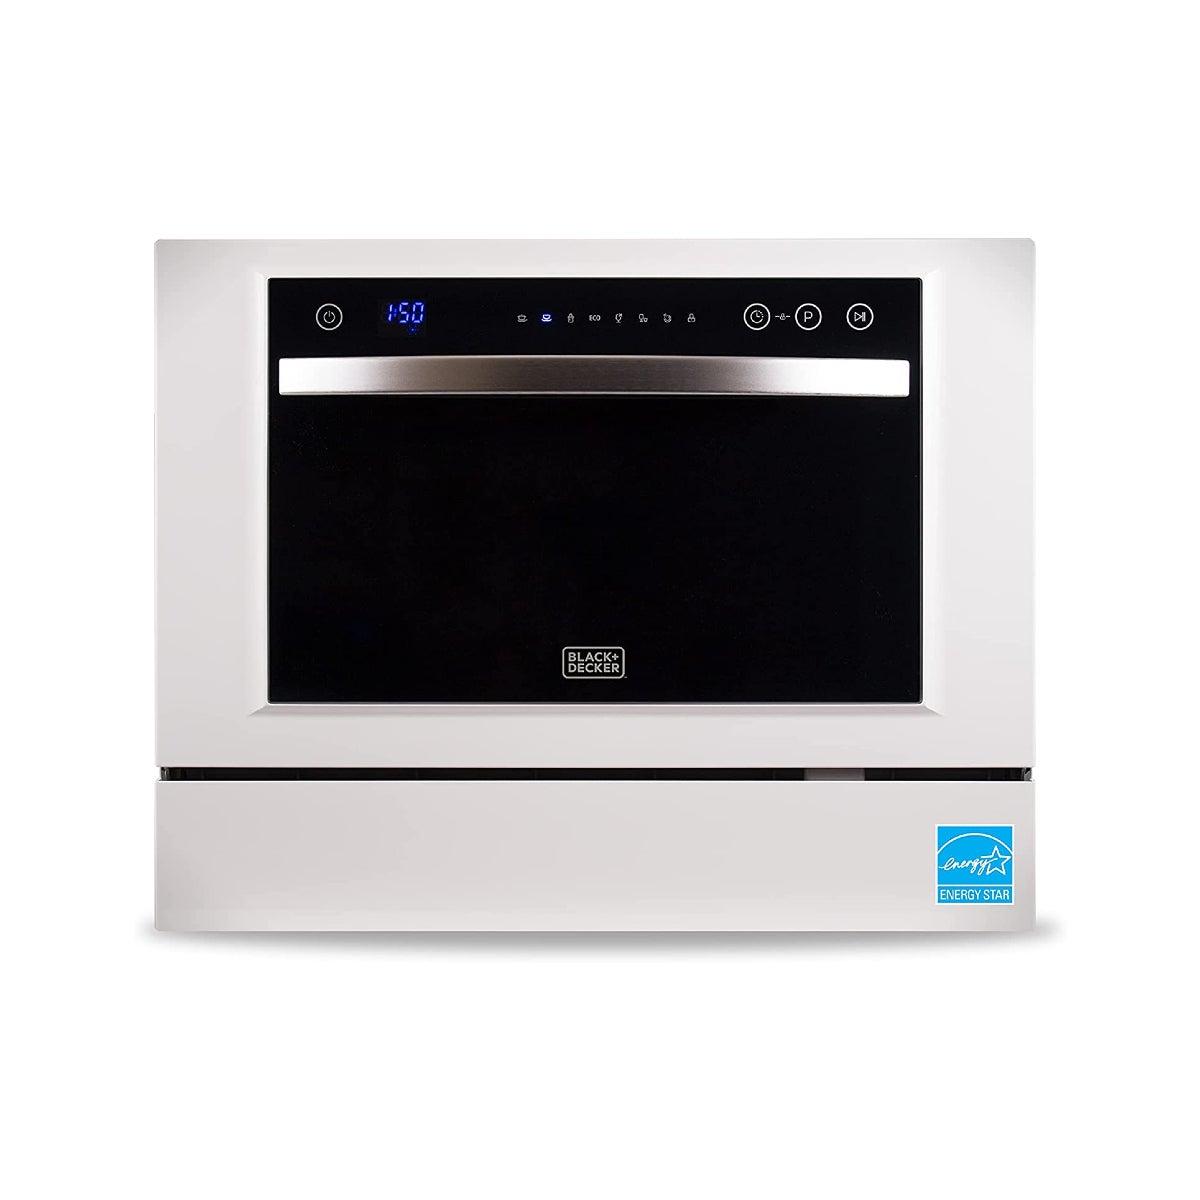 Best-Dishwashers-Option-Black-+-Decker-Compact-Countertop-Dishwasher